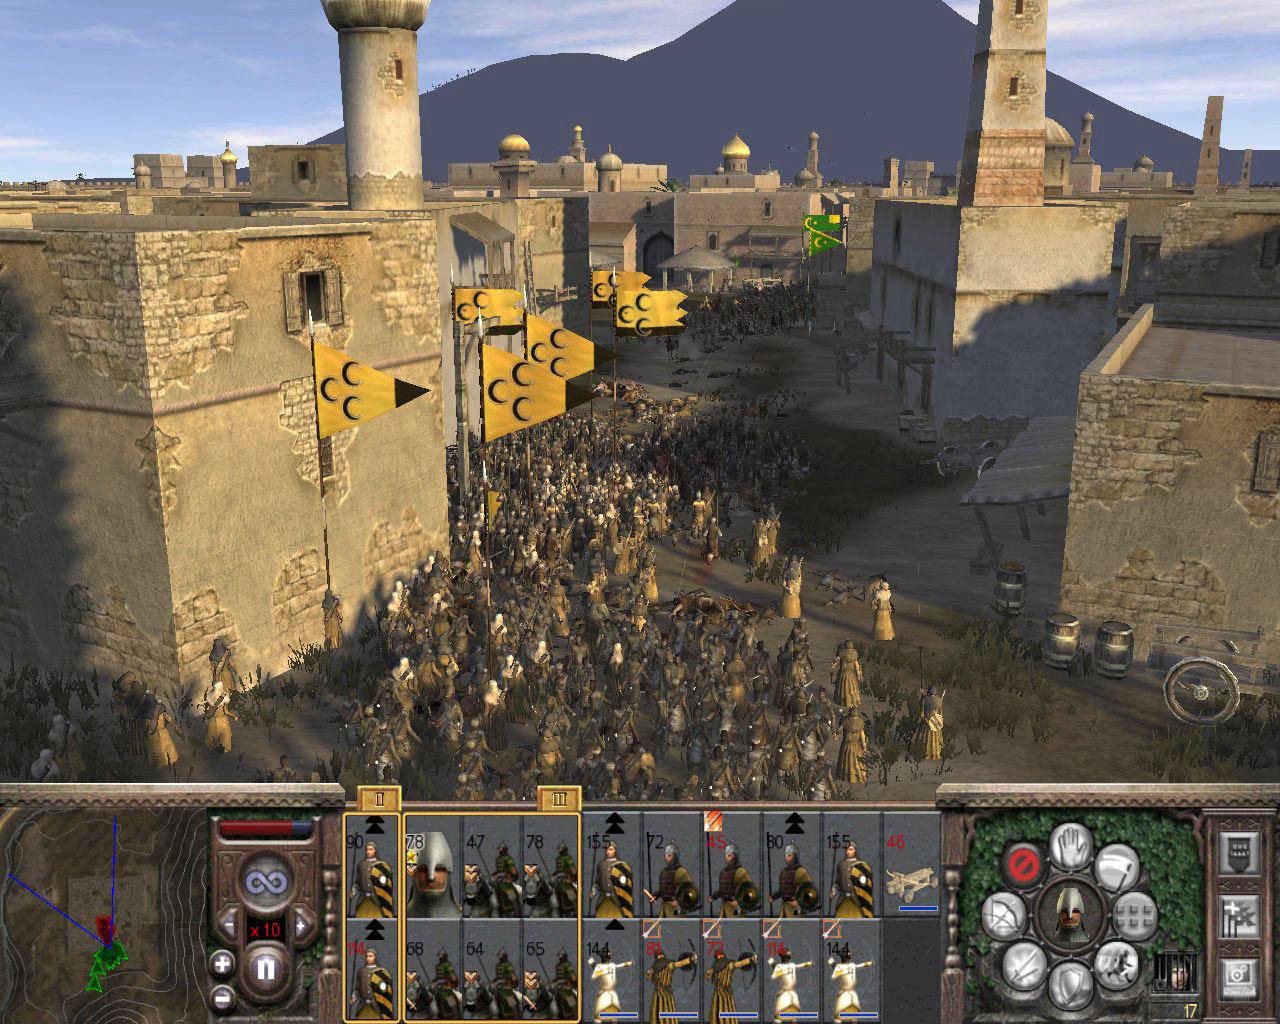 Total War (series)